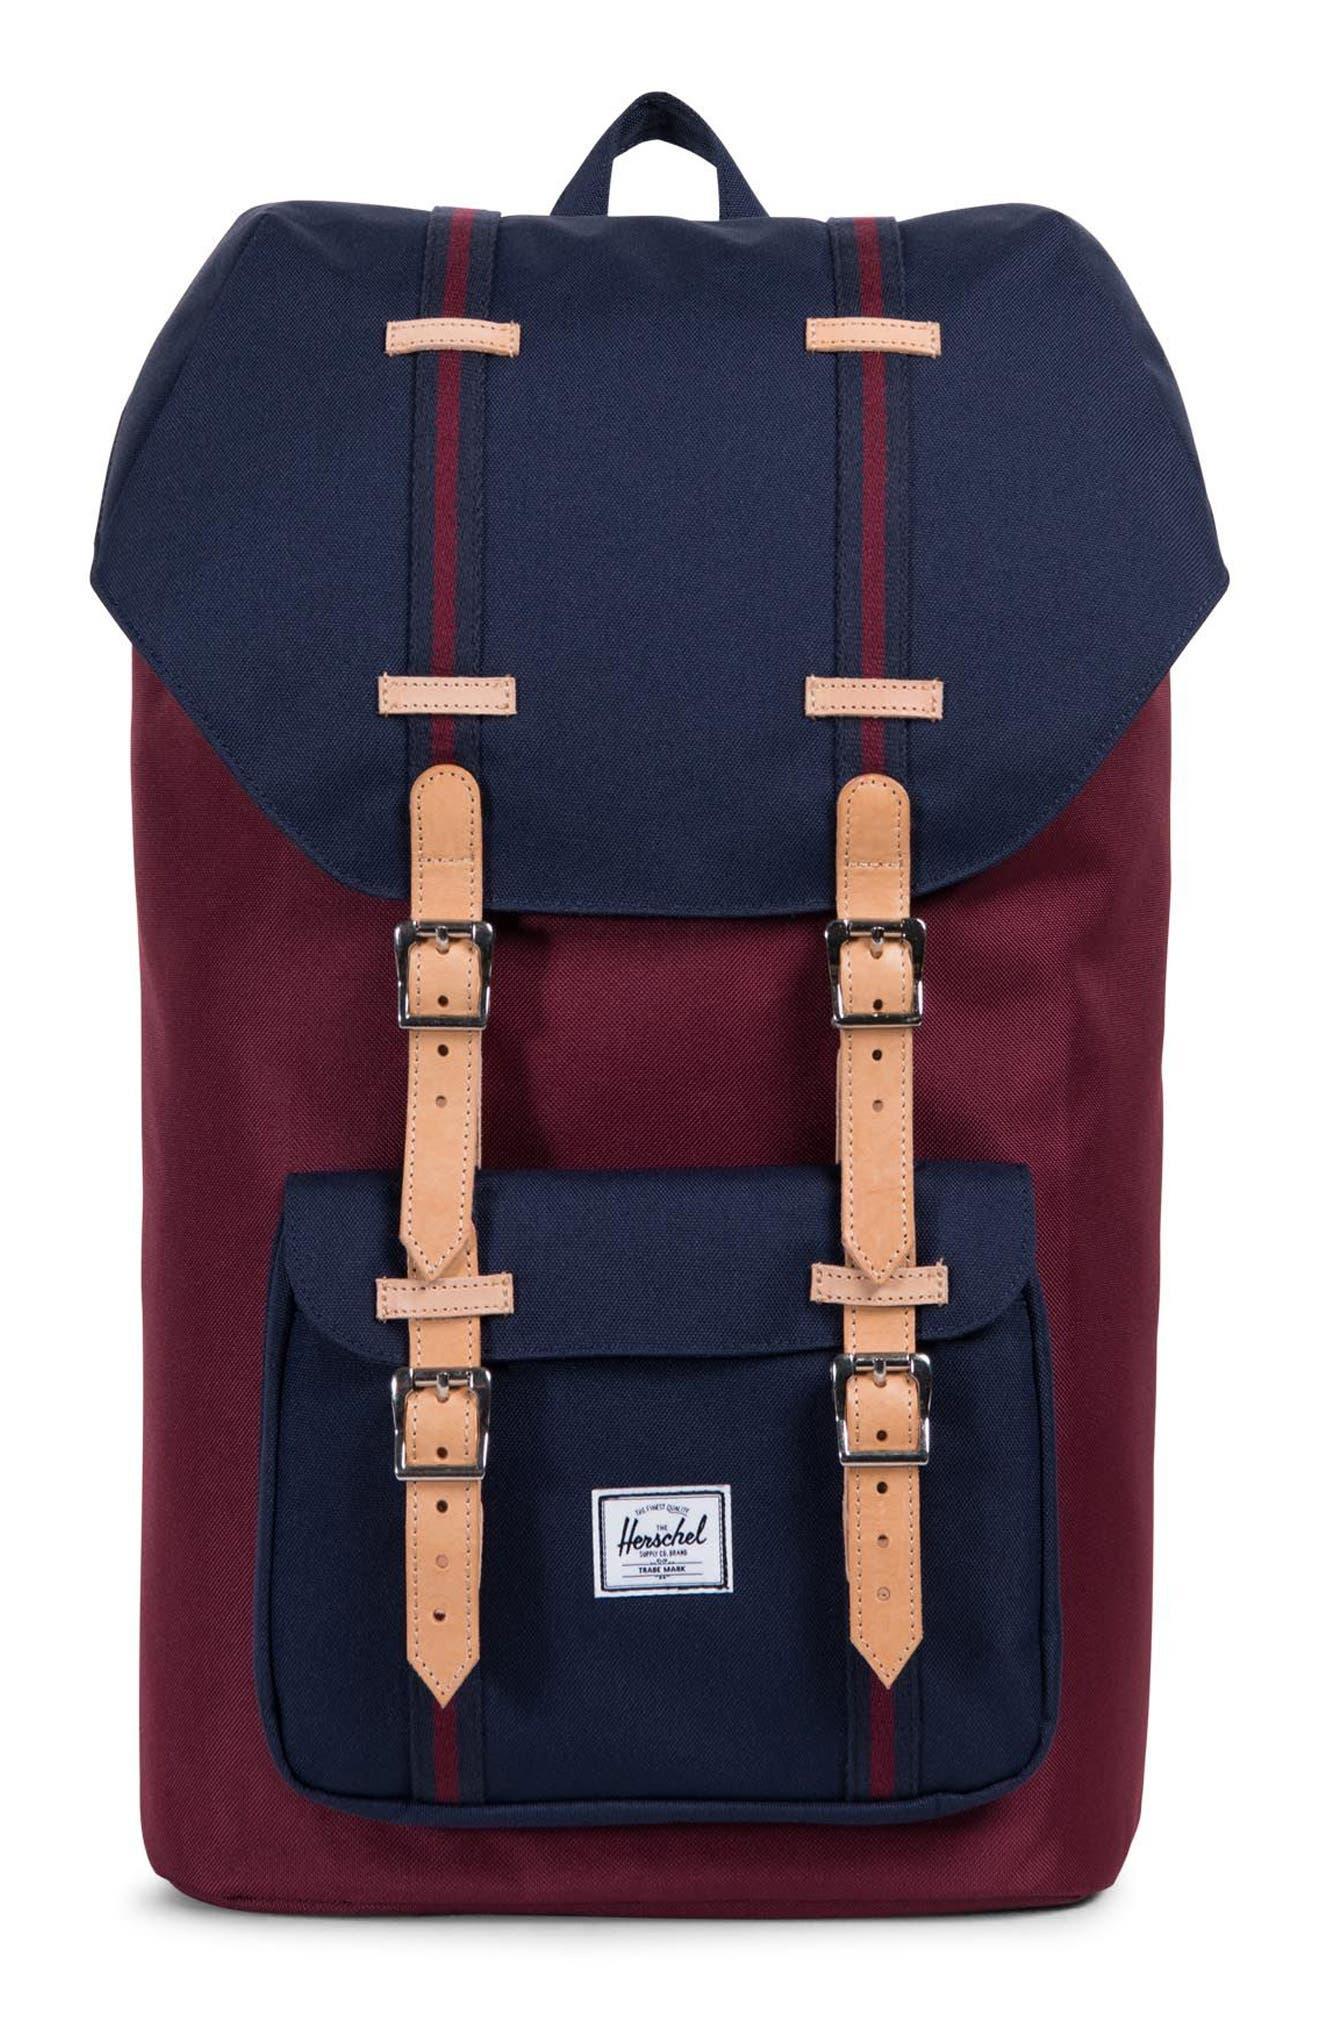 Little America Backpack,                             Main thumbnail 1, color,                             Windsor Wine/